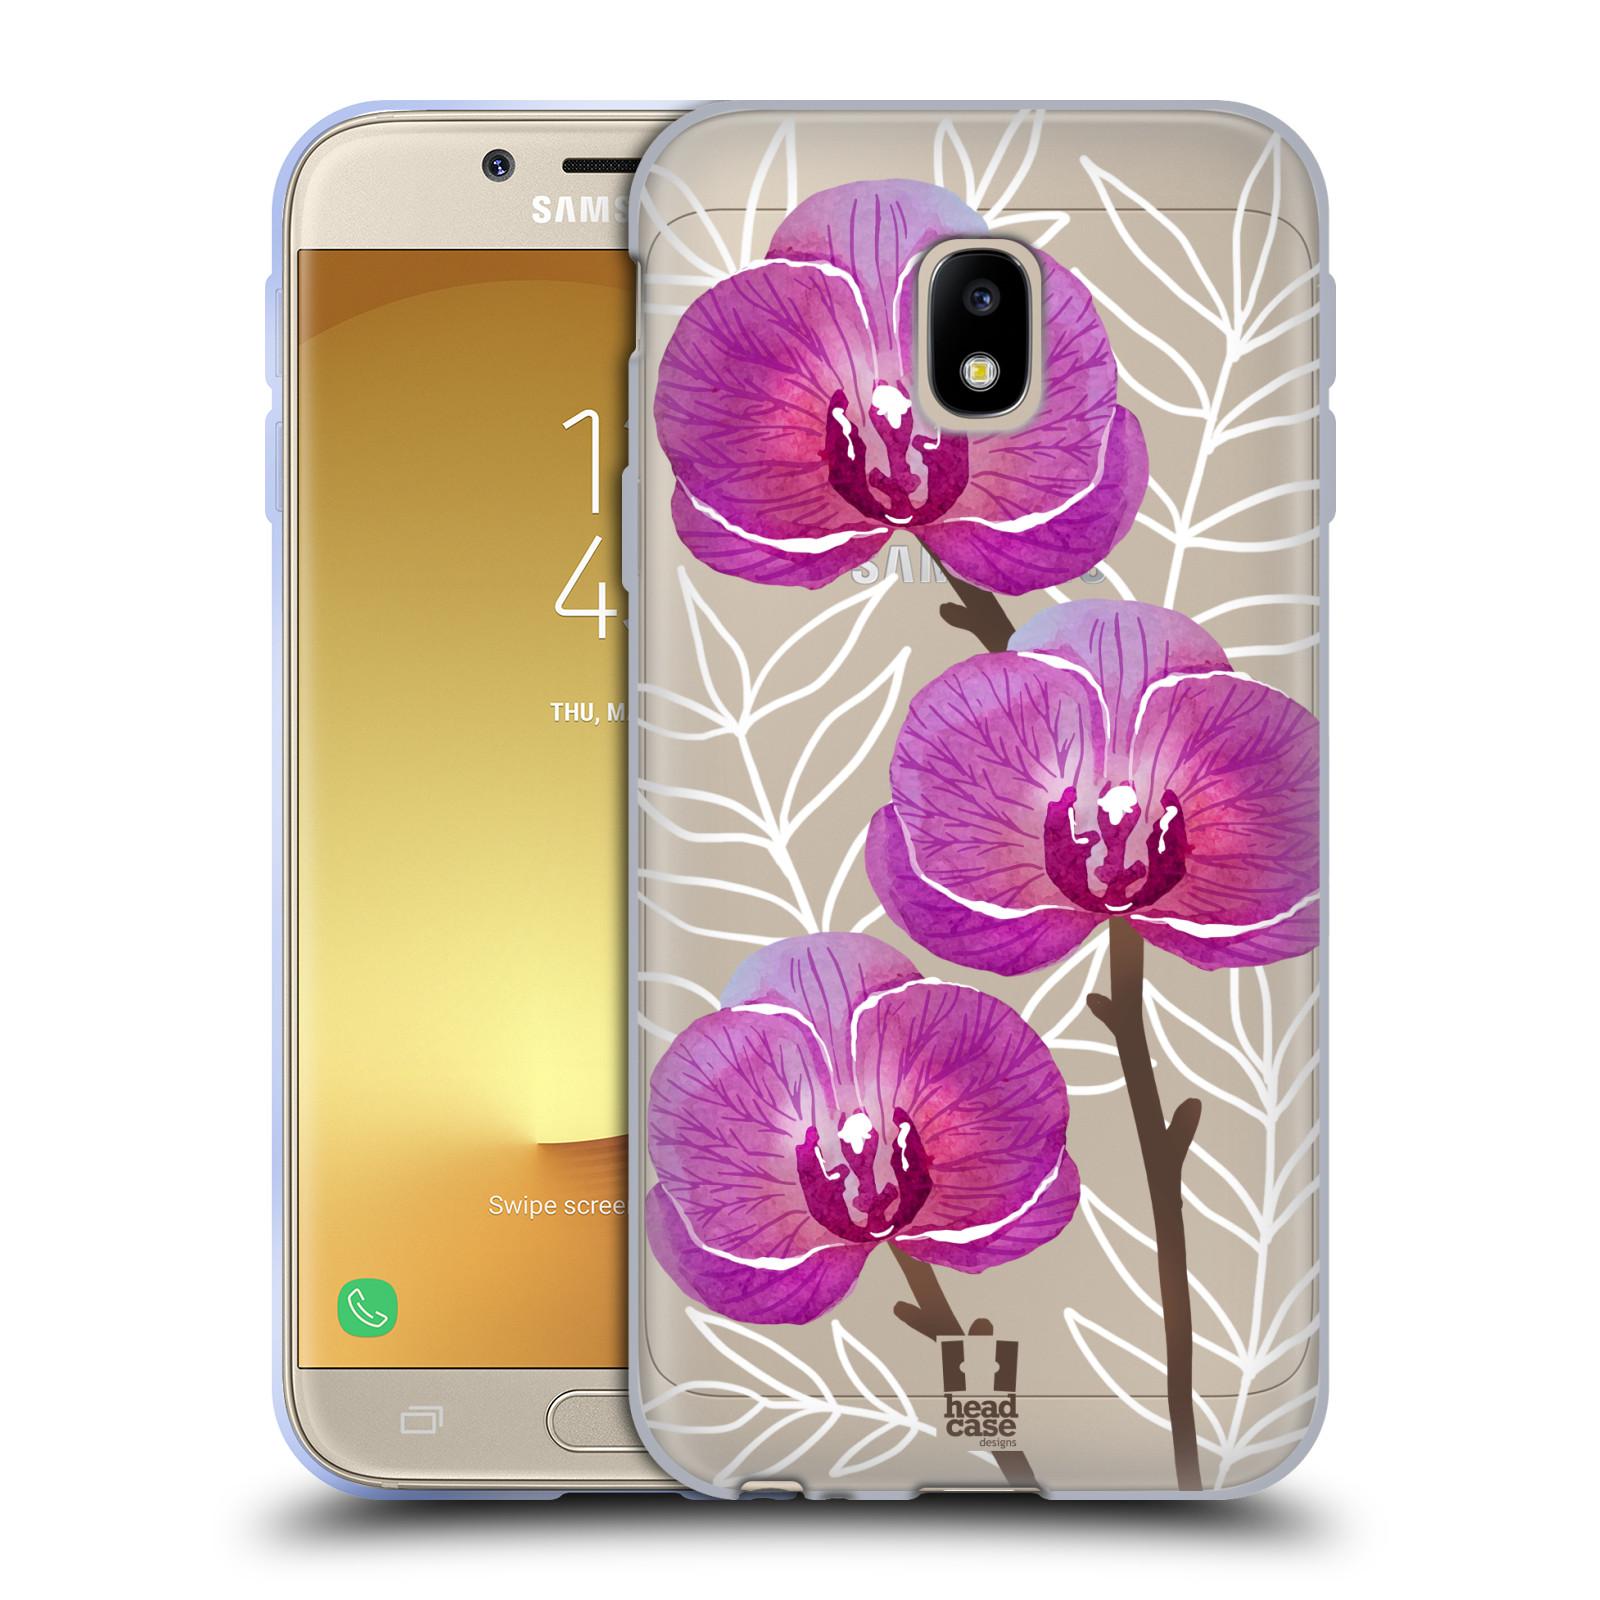 Silikonové pouzdro na mobil Samsung Galaxy J3 (2017) - Head Case - Hezoučké kvítky - průhledné